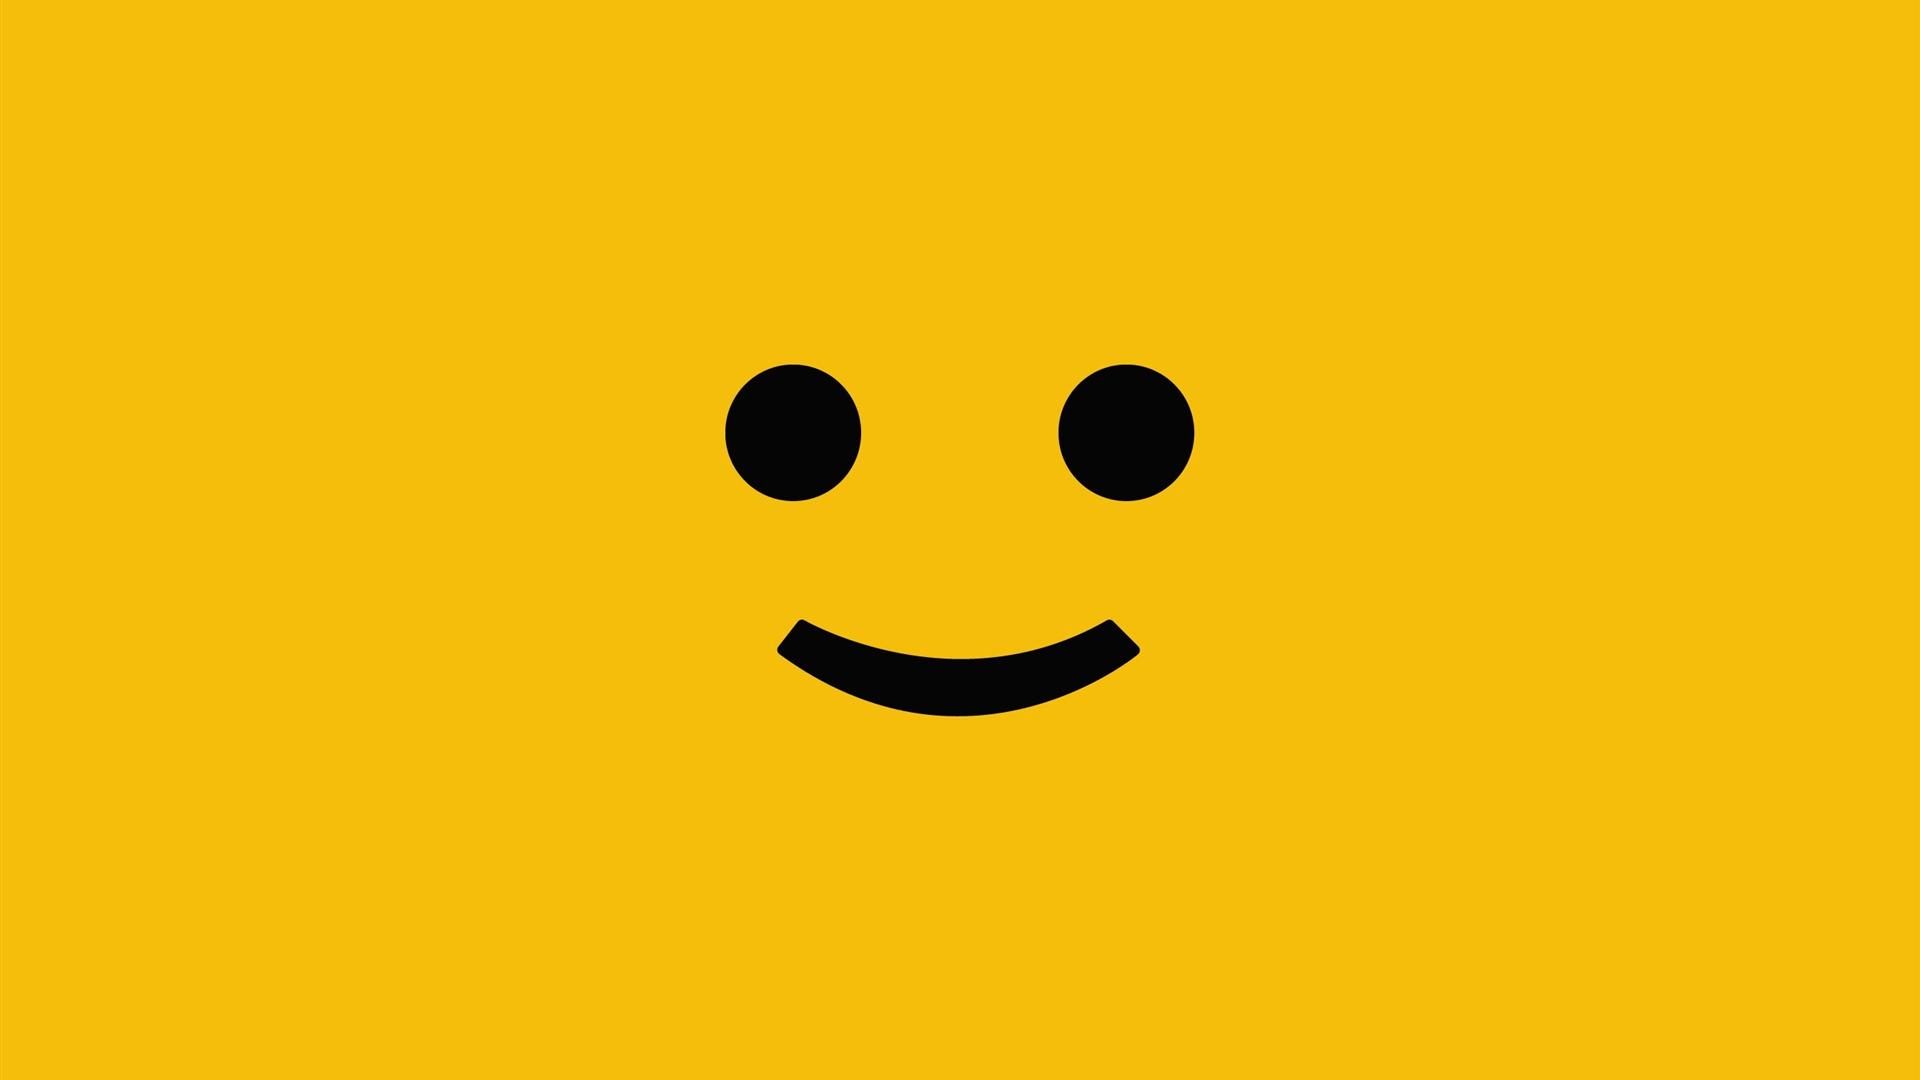 smiley face Cute funny design desktop picture   1920x1080 wallpaper 1920x1080